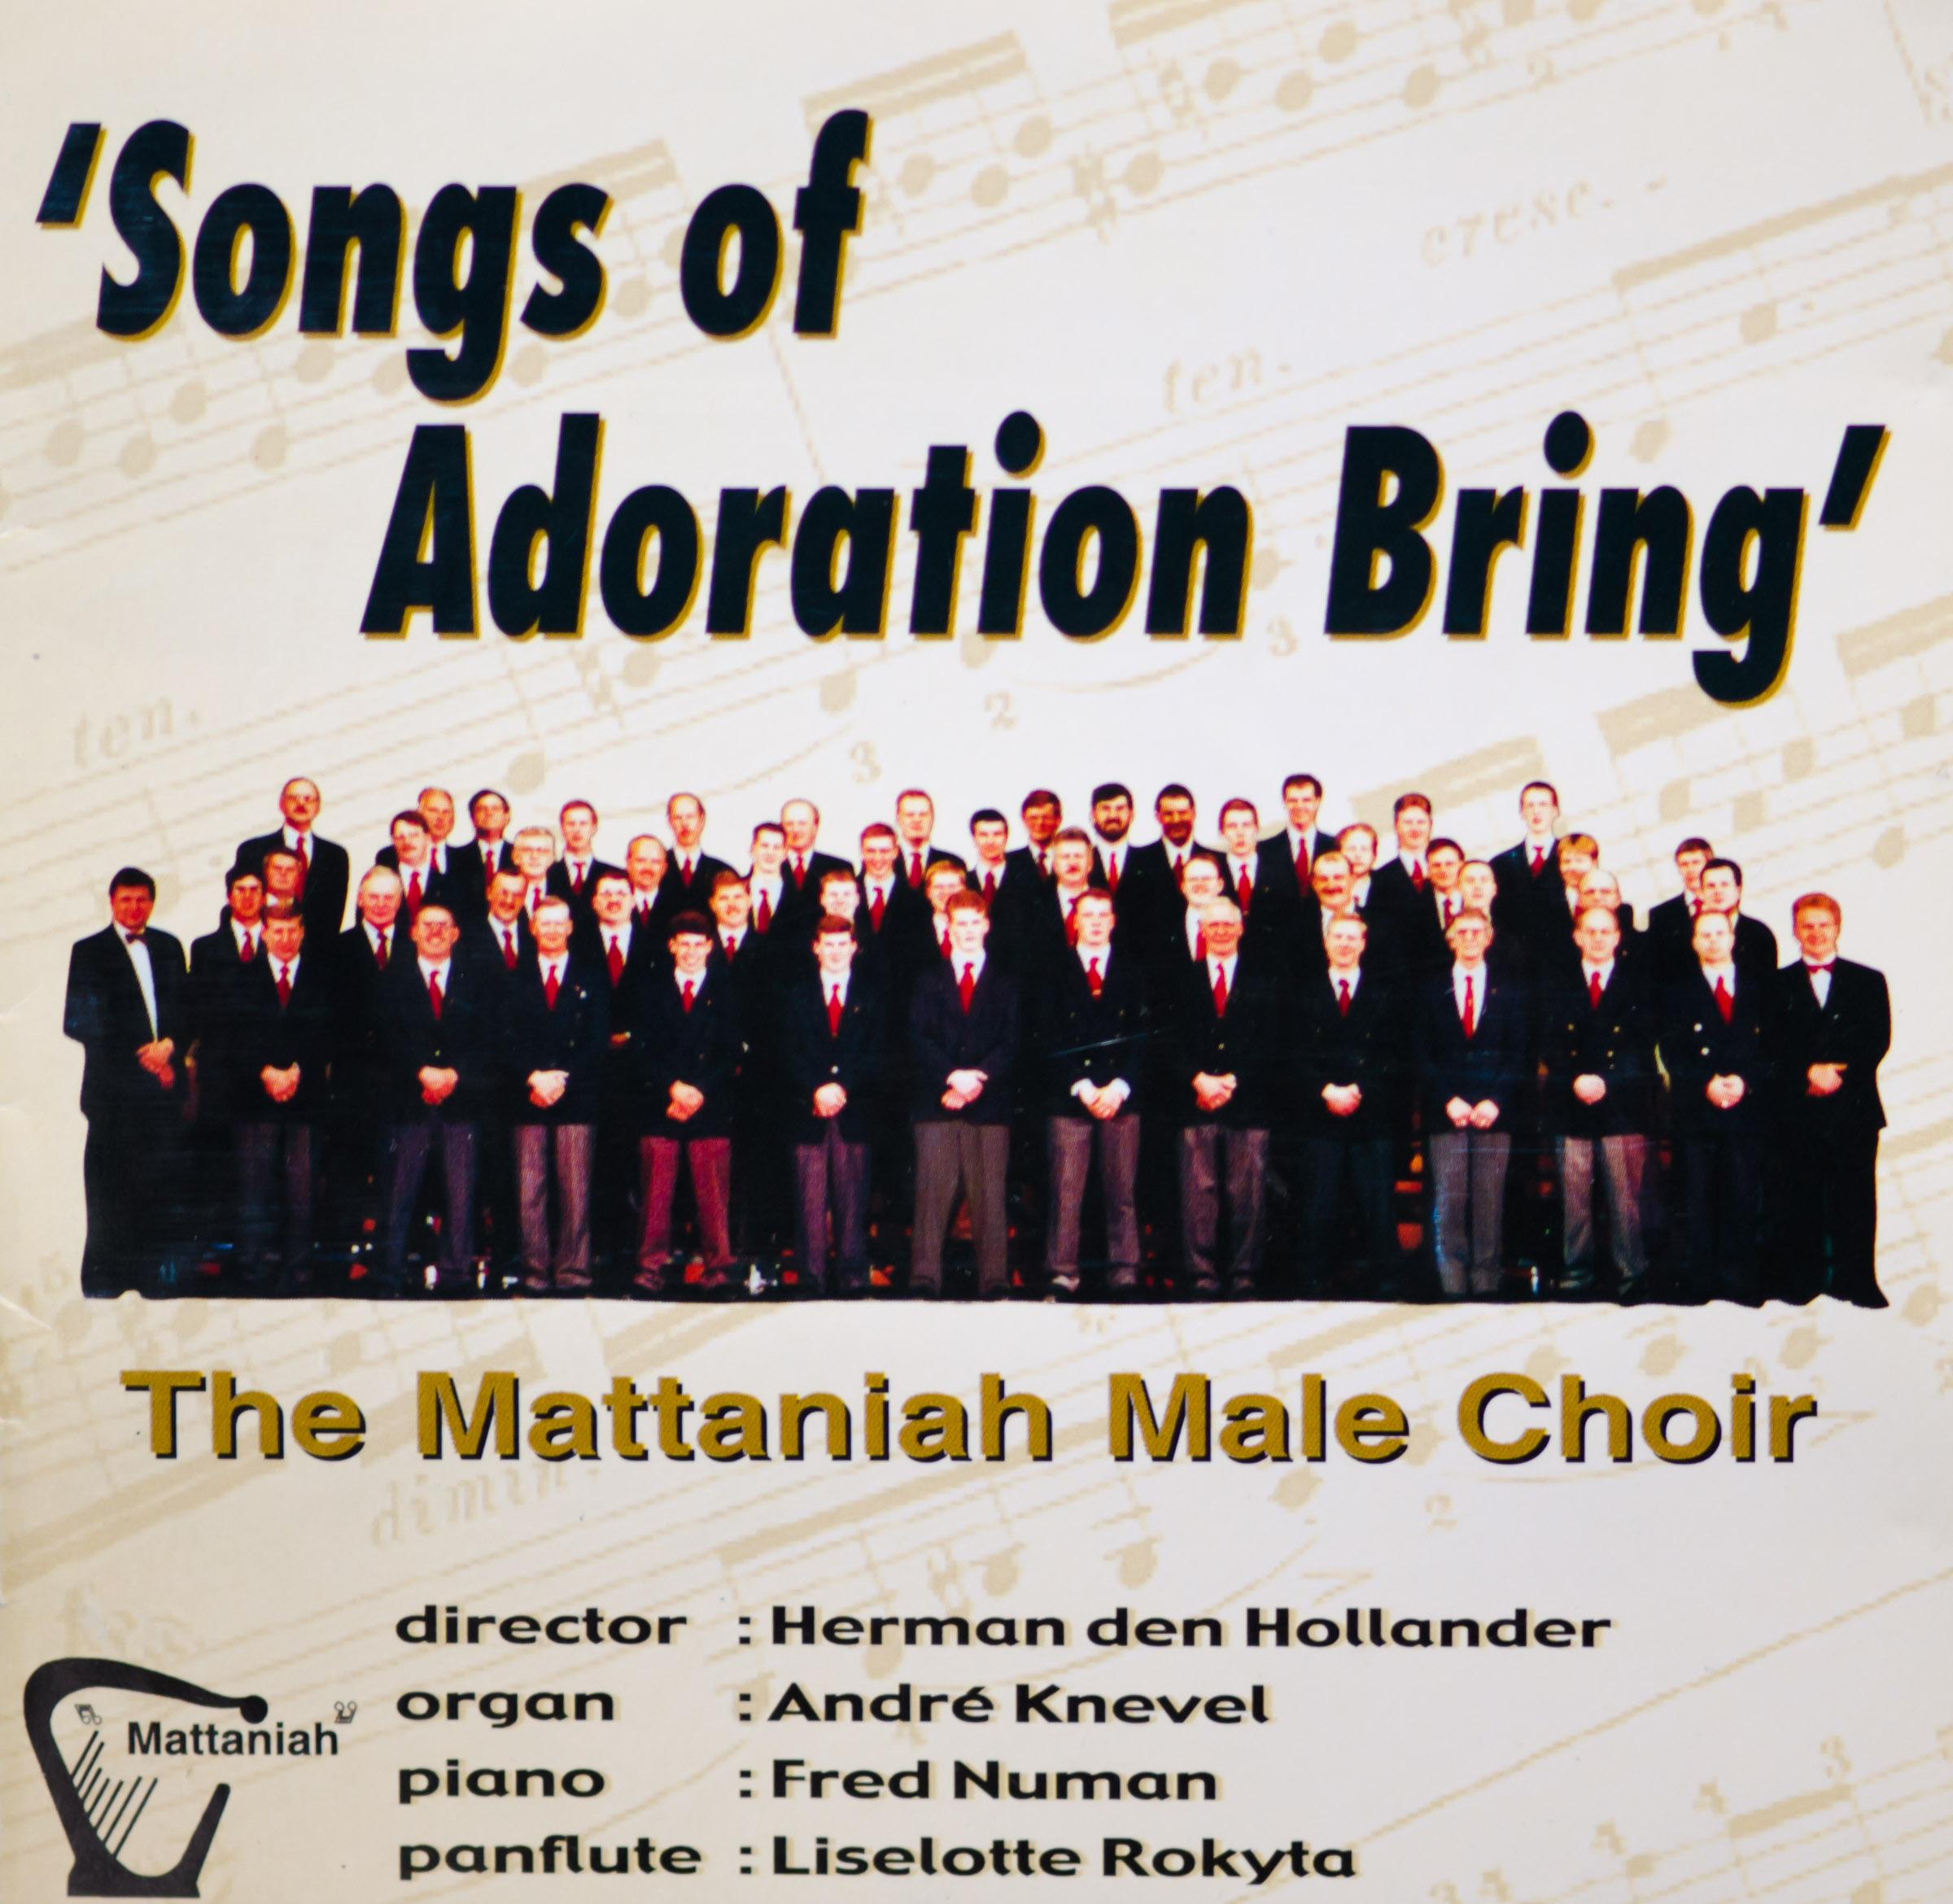 Songs Of Adoration Bring (1 of 1).jpg